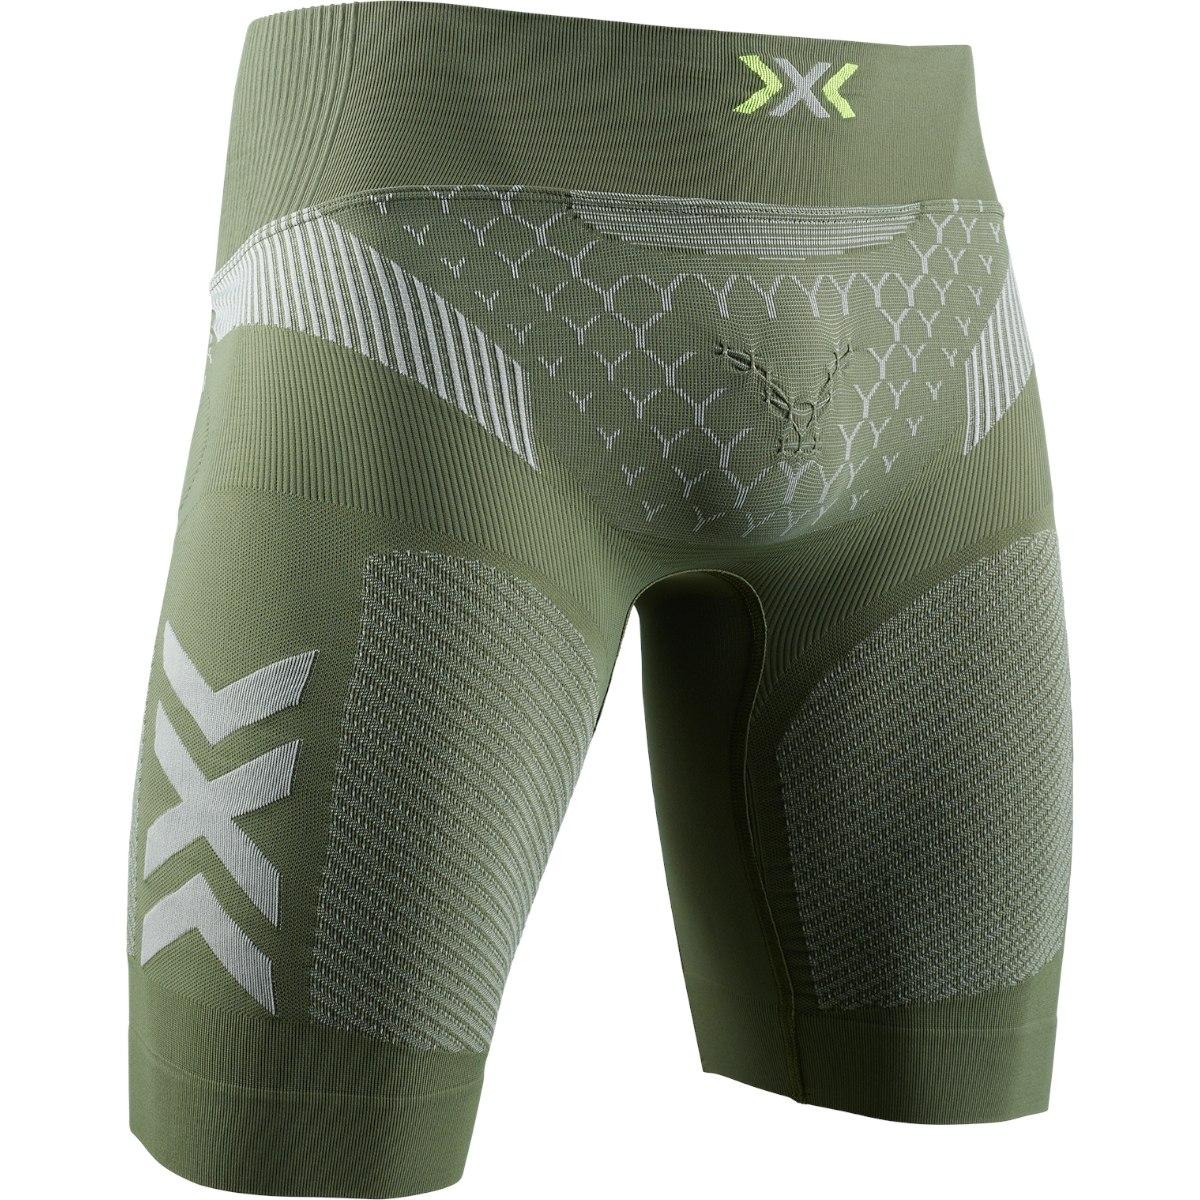 X-Bionic TWYCE 4.0 Run Shorts Laufhose für Herren - olive green/dolomite grey